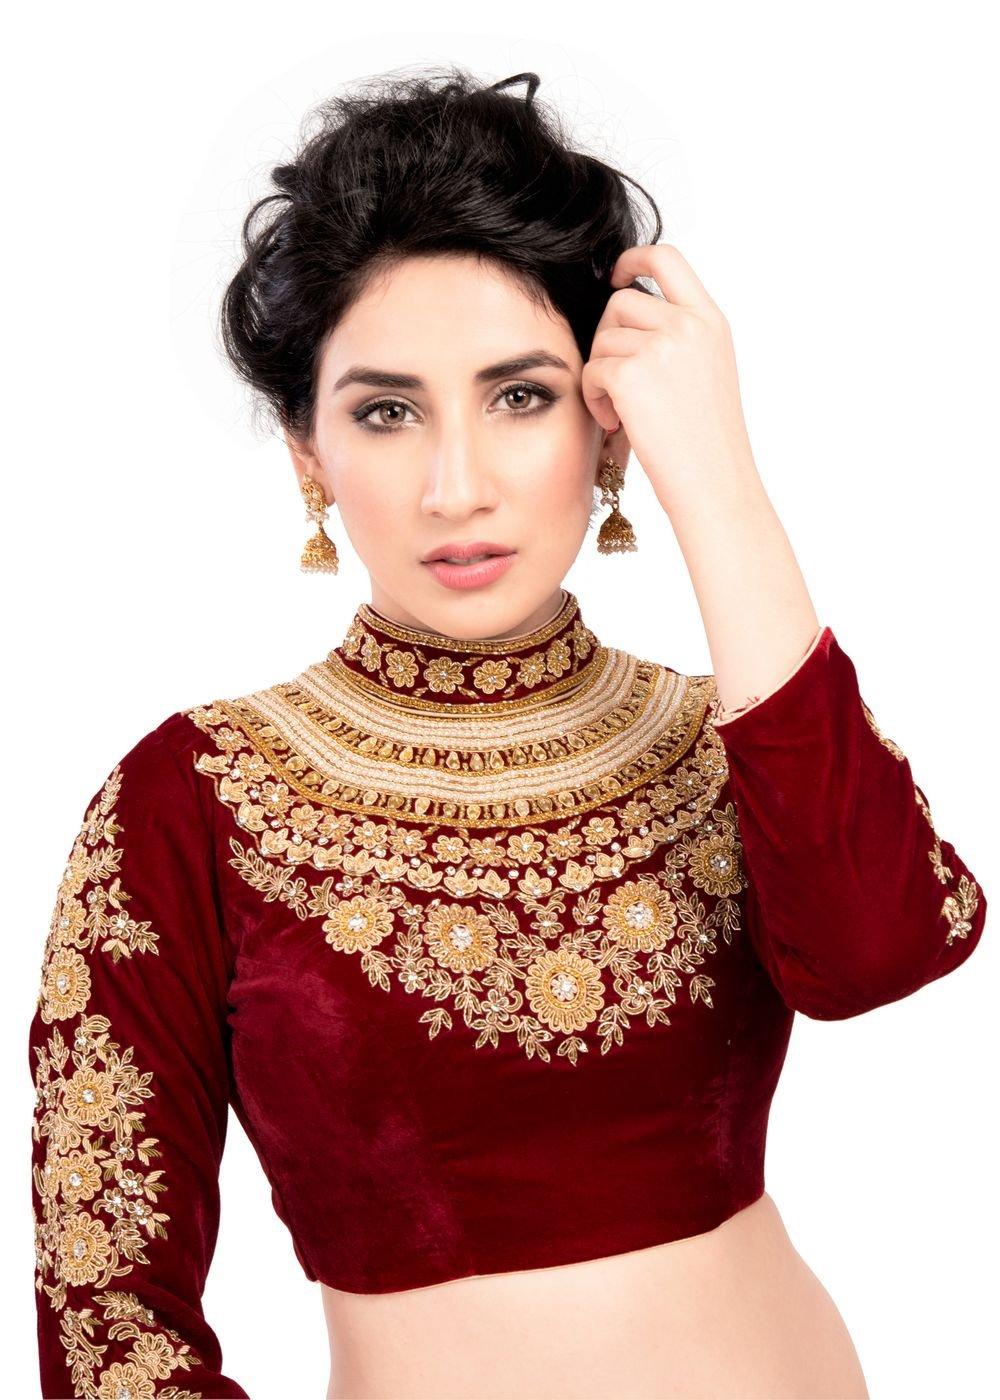 Maharana Full Sleeve Maroon Velvet Saree Blouse Sari Choli Crop Top - KP-72